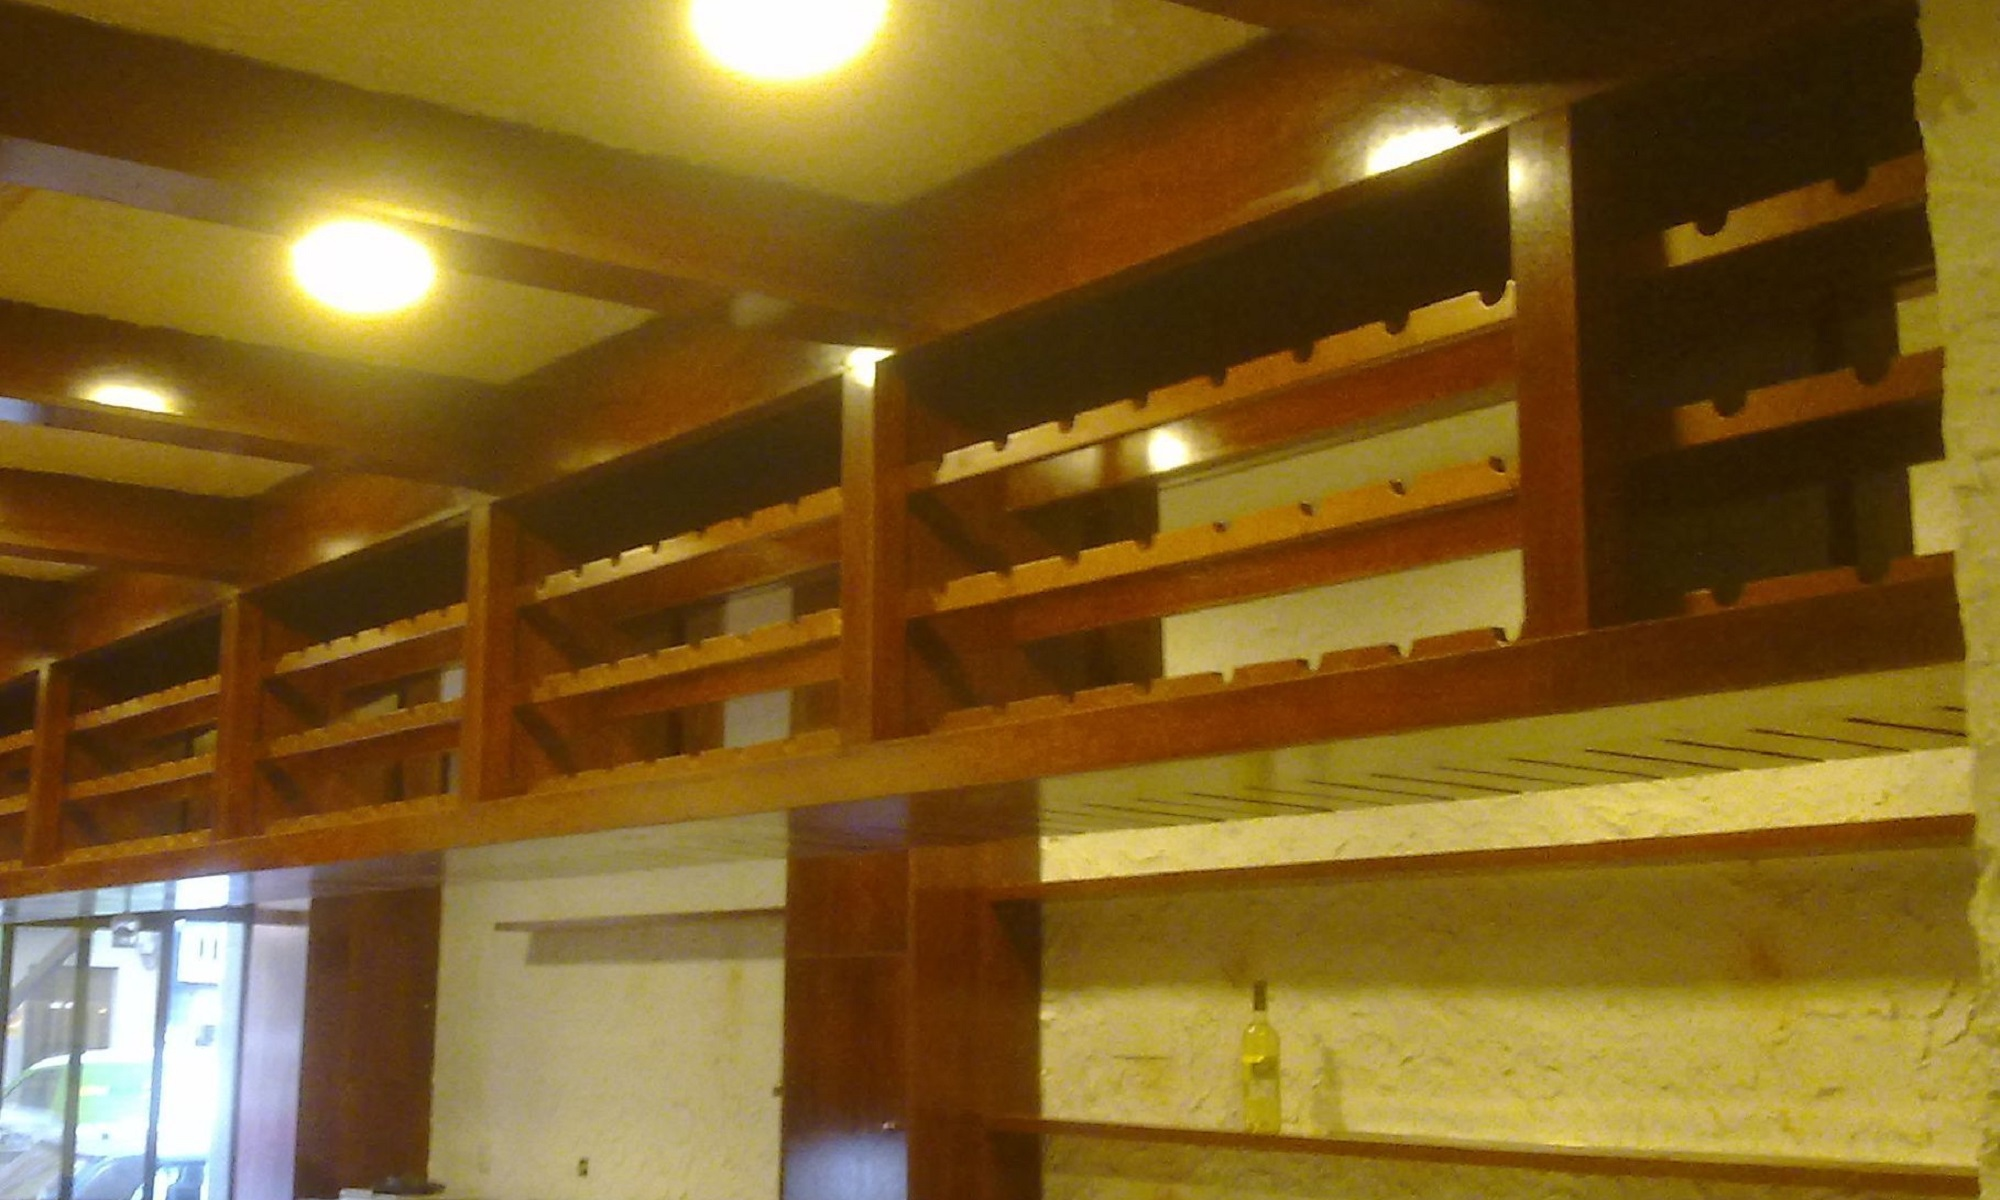 Muebles A Medida Carpinteria Torrent Valencia Amdecoracion # Muebles Sedavi En Torrente